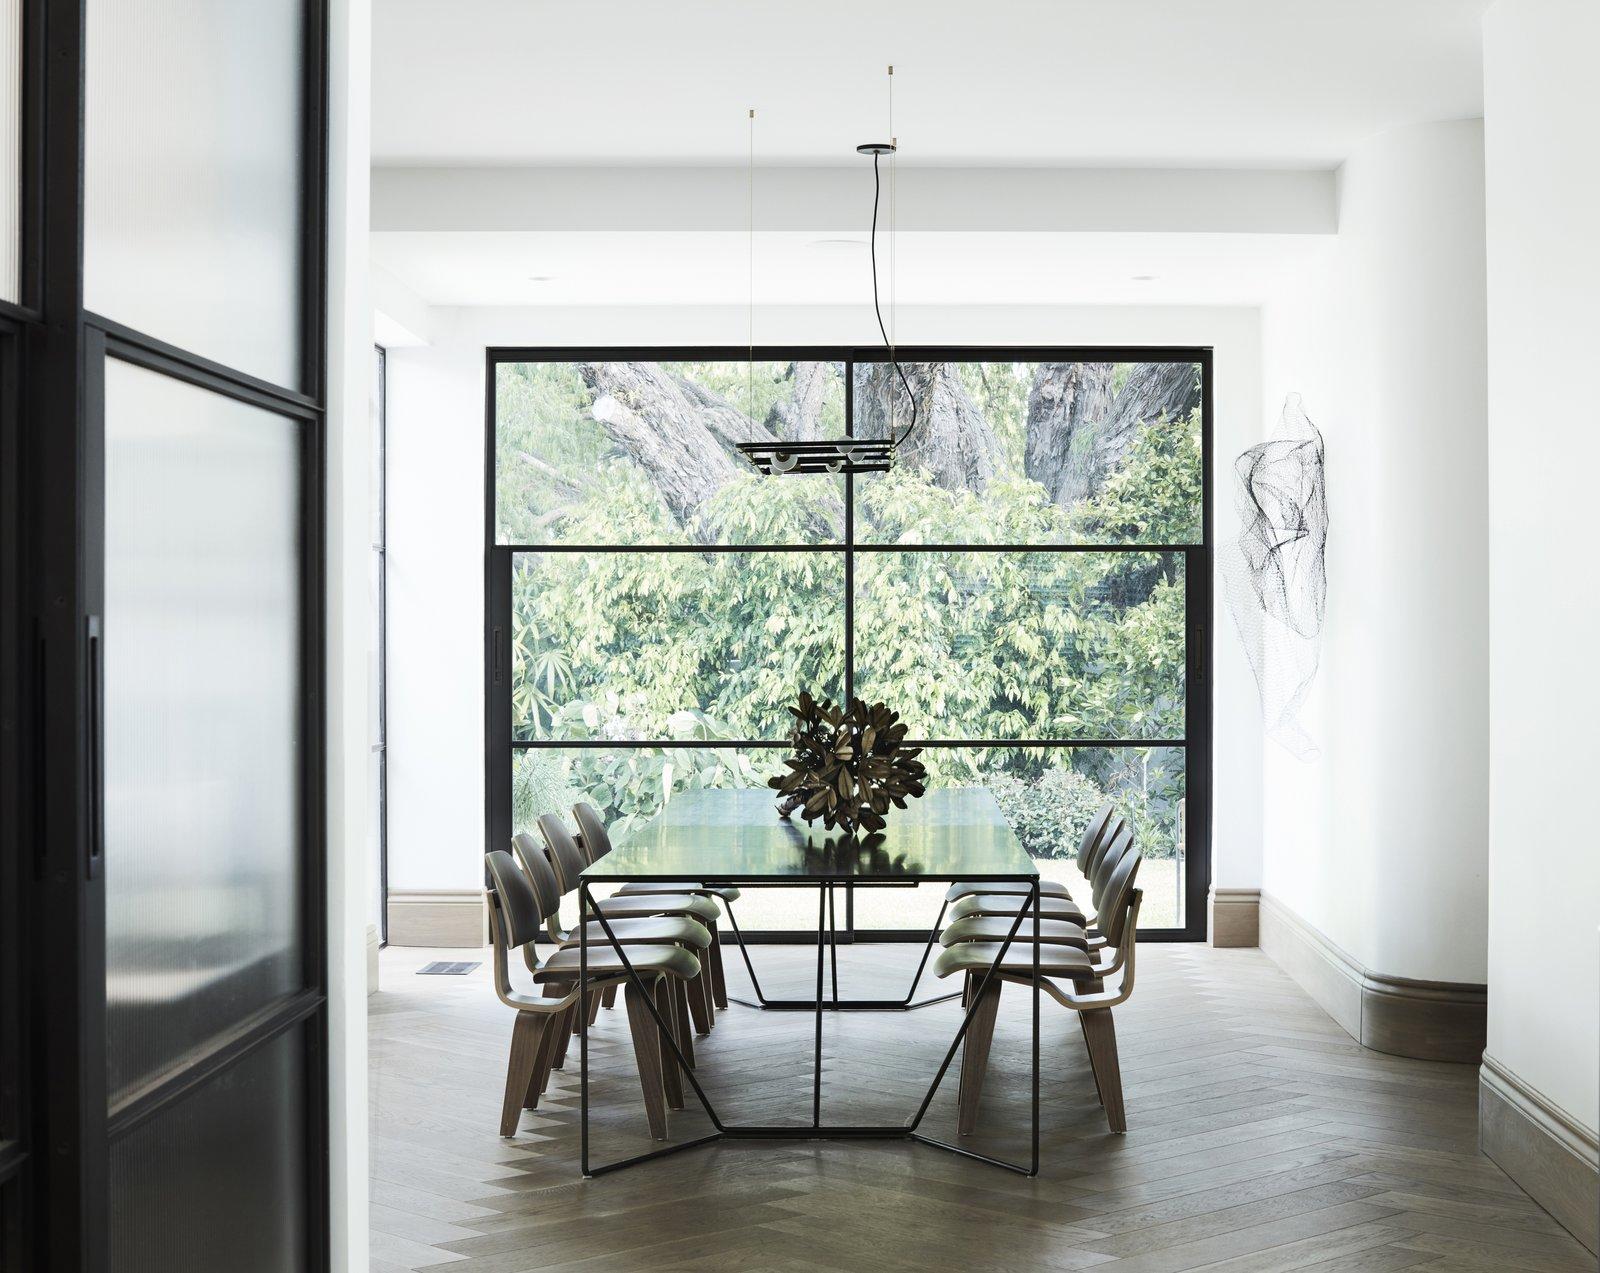 Dining Room, Table Lighting, Pendant Lighting, Ceiling Lighting, Table, Medium Hardwood Floor, and Chair  Best Photos from Peppertree Villa